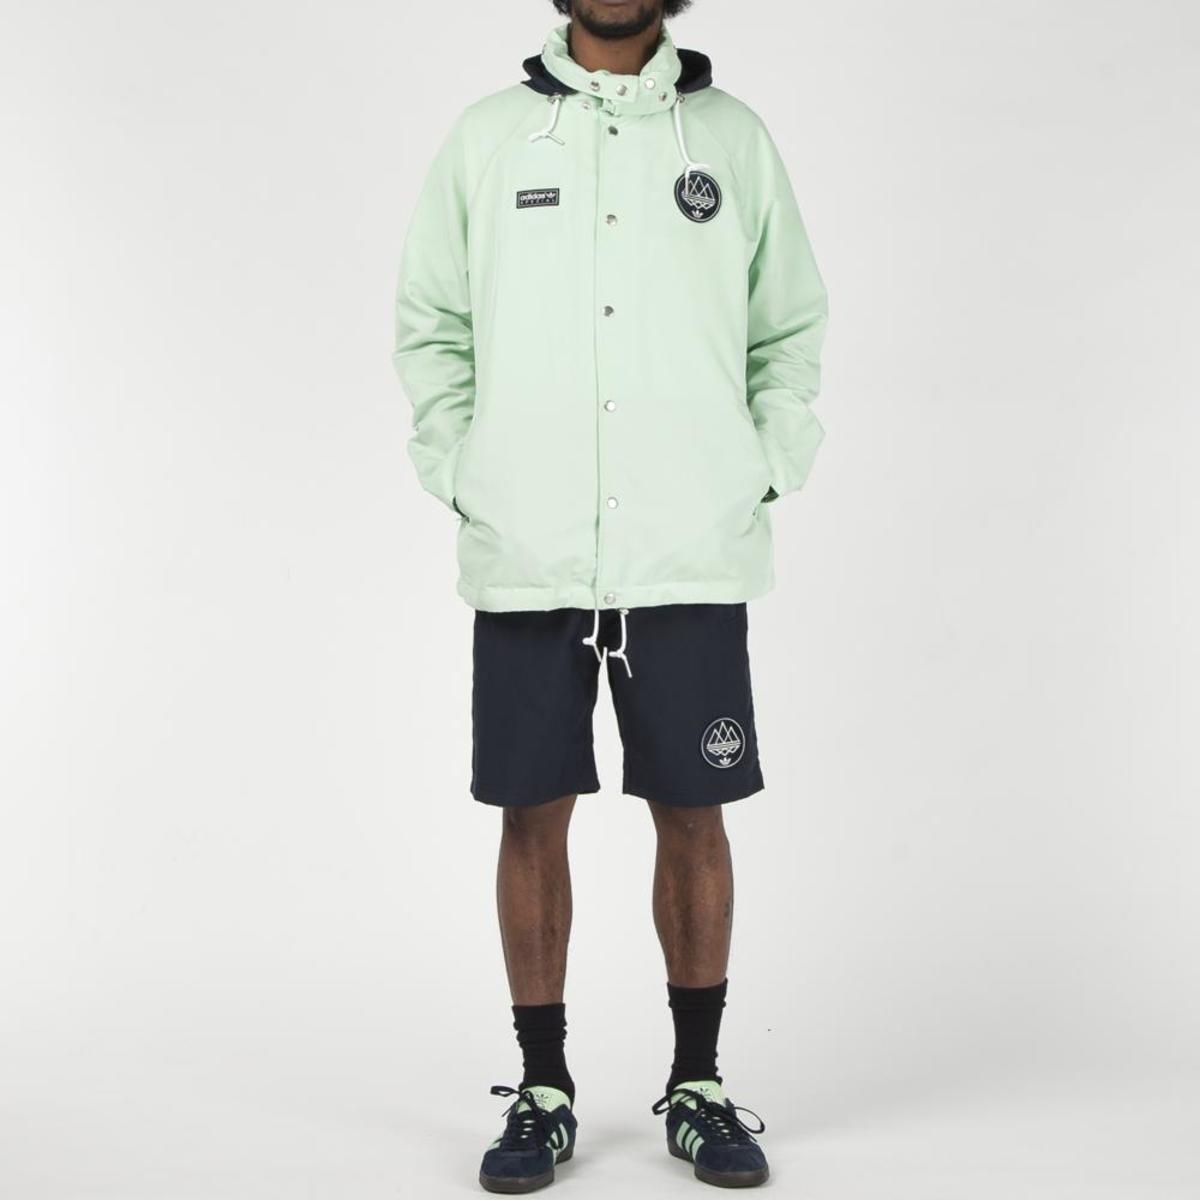 Adidas Spezial Livesey Anorak Spring